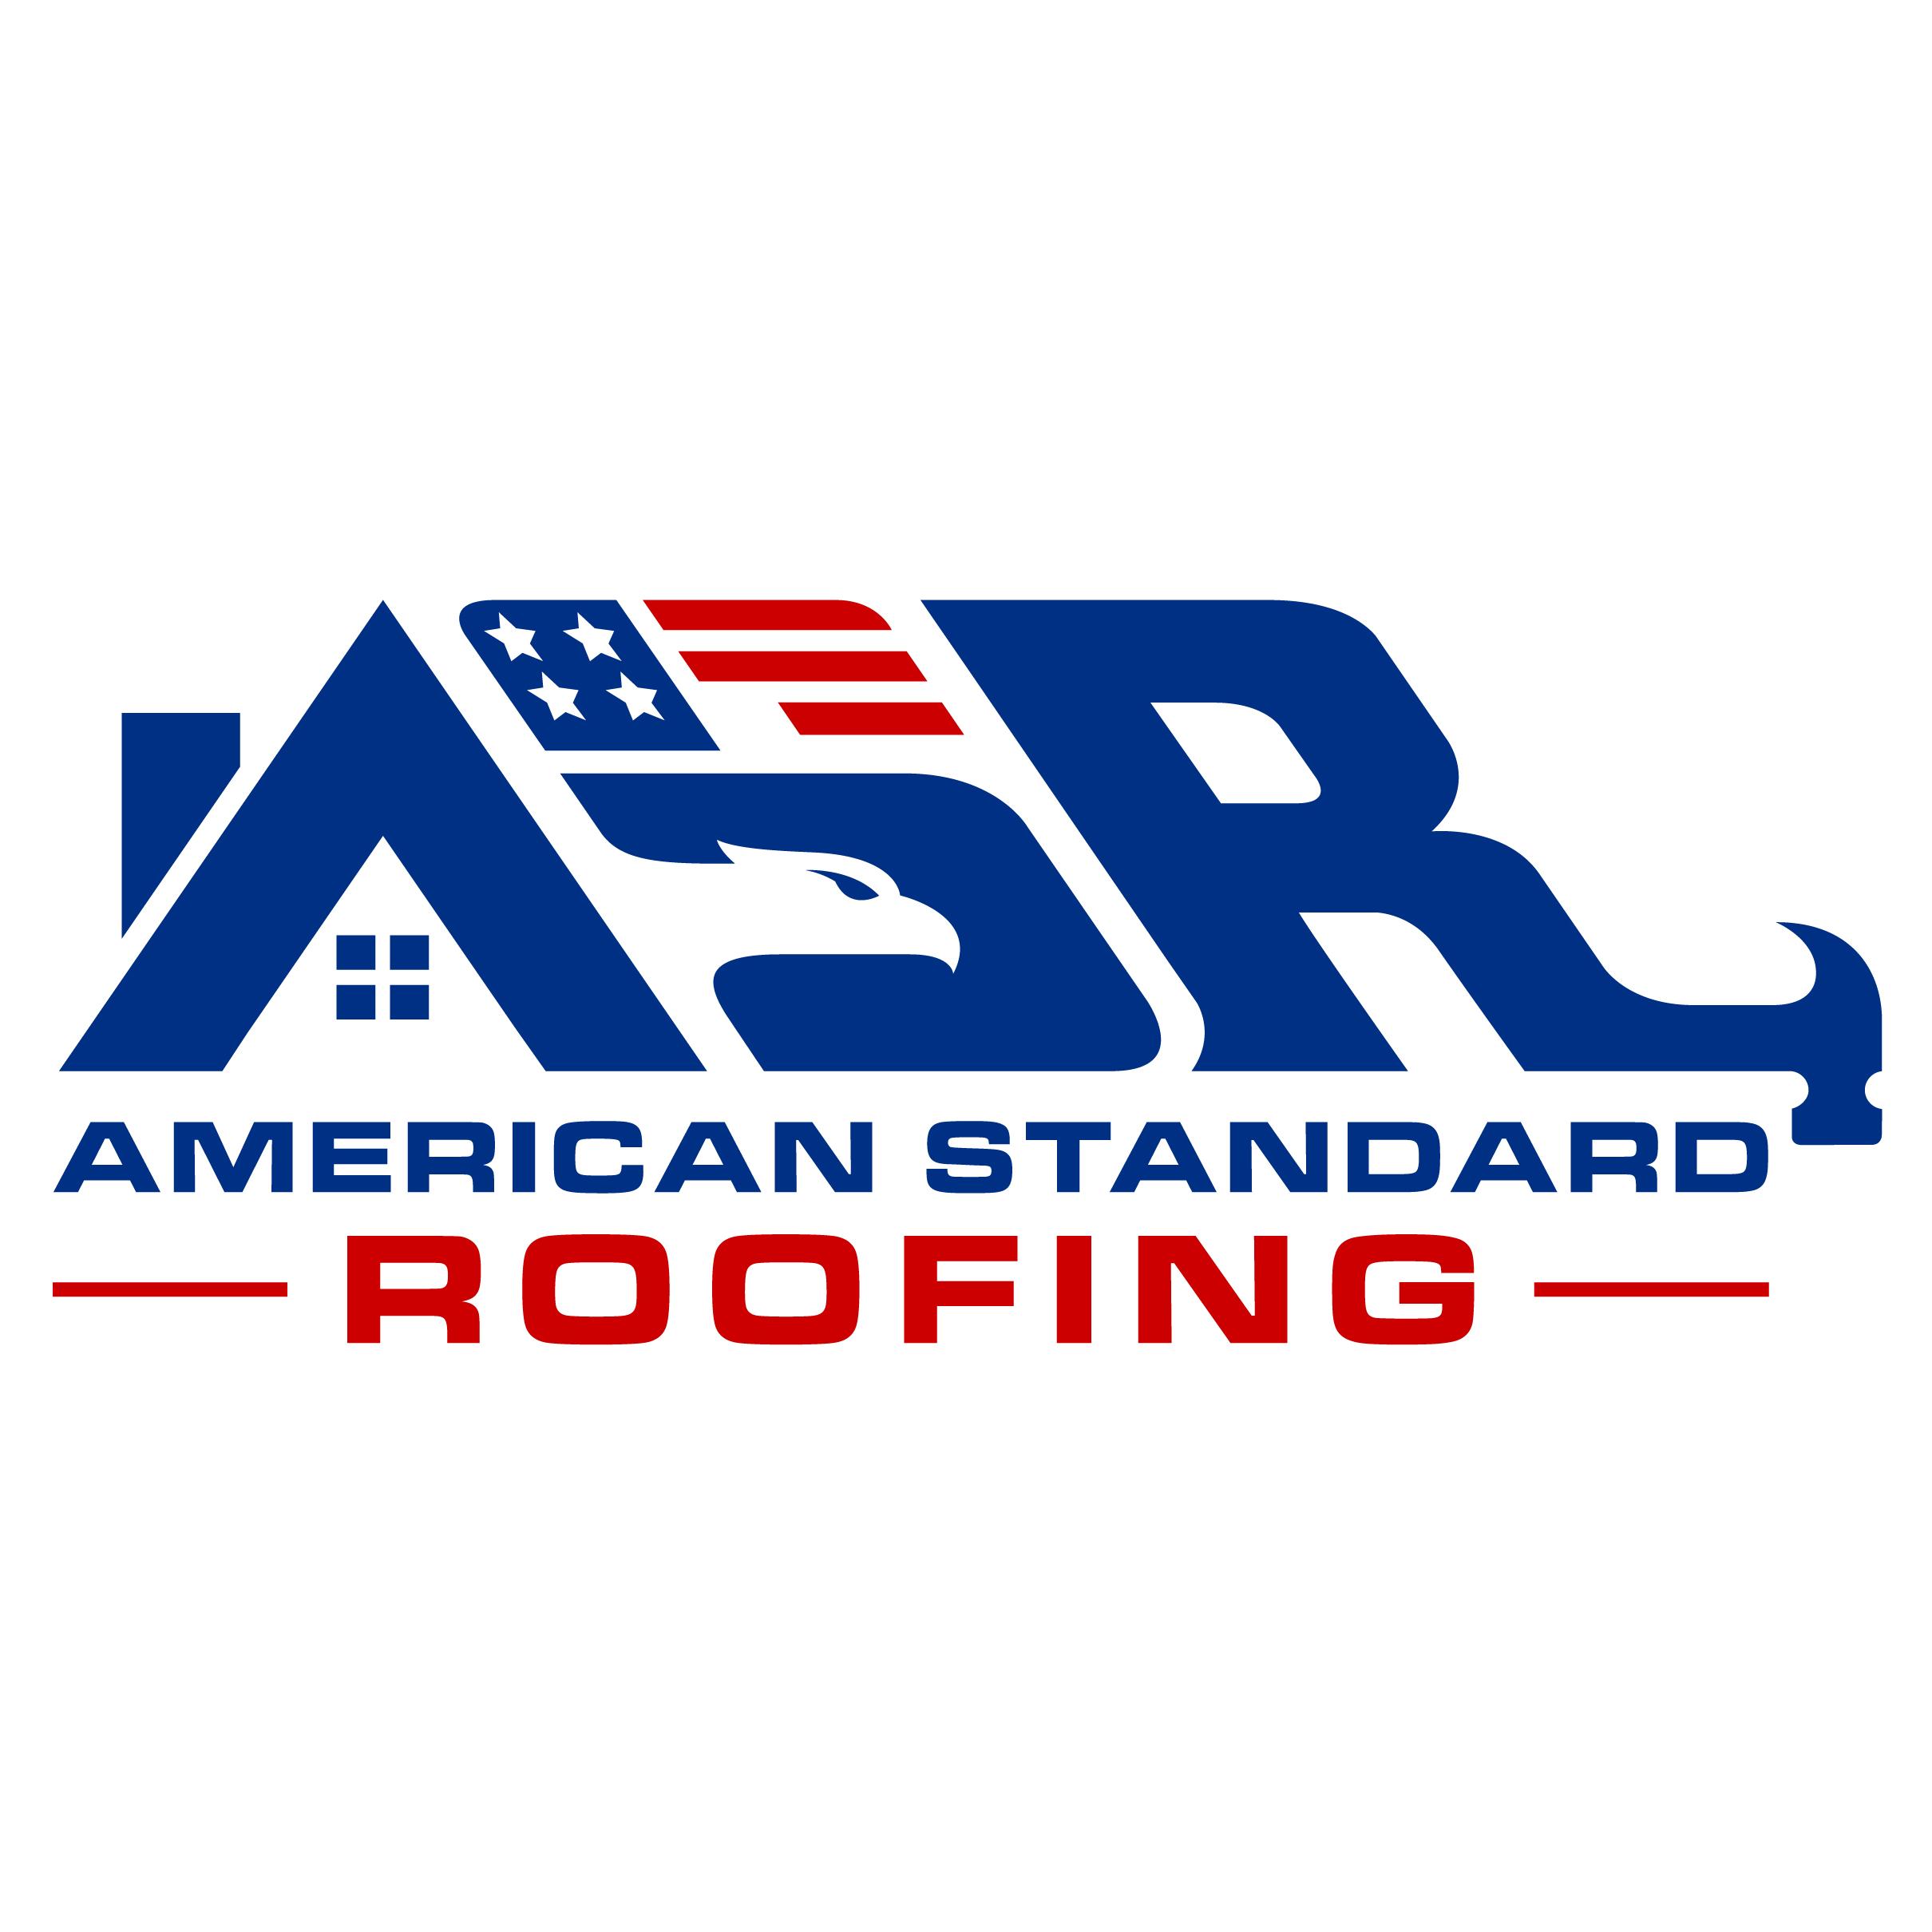 American Standard Roofing - Southfield, MI - Roofing Contractors